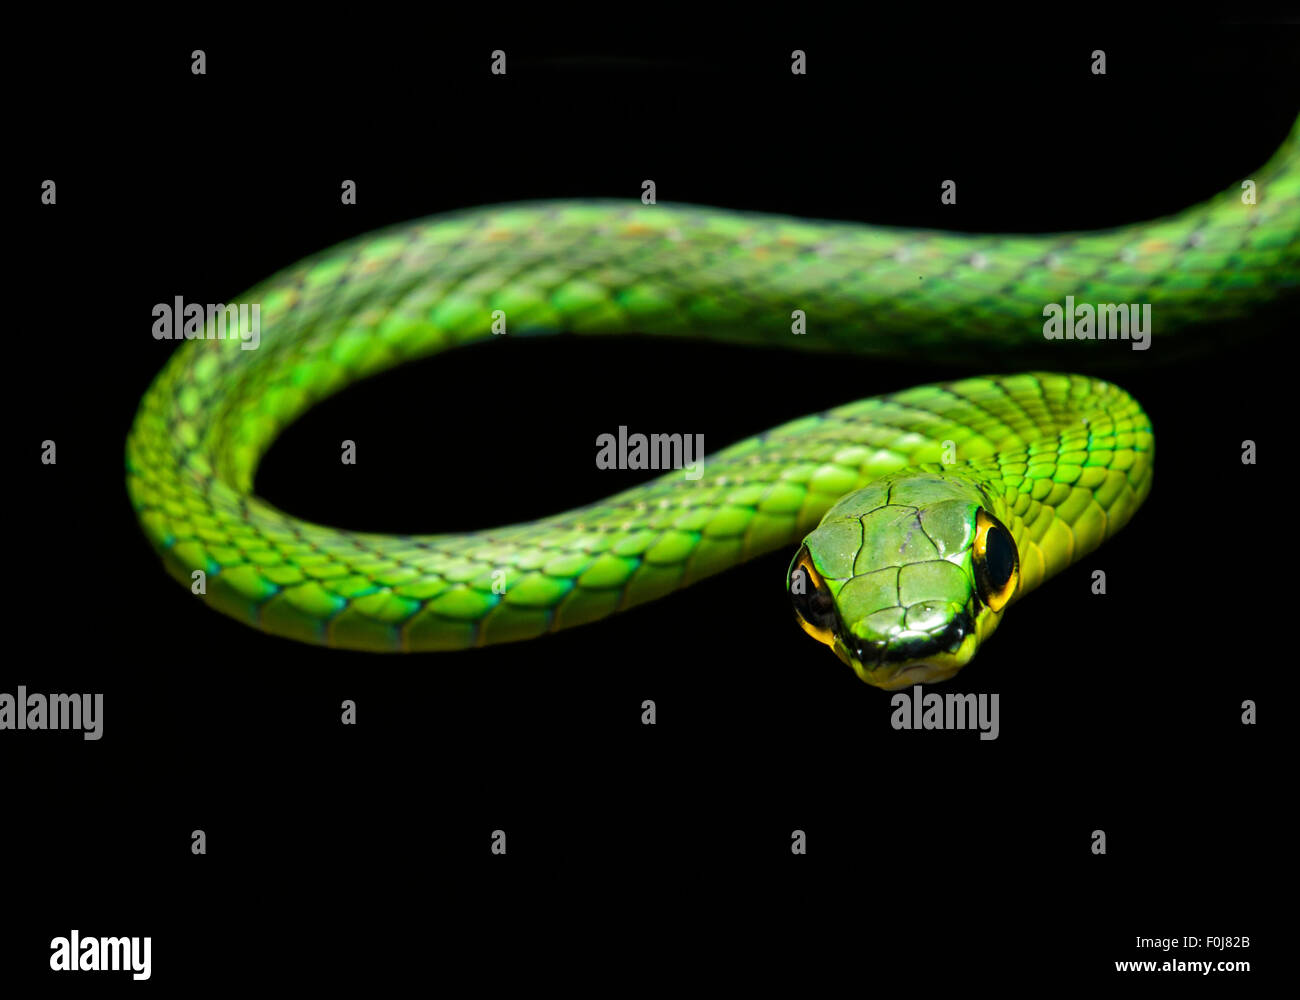 Cope's vine snake (Oxybelis brevirostris), snake (Colubridae), Chocó rainforest, Ecuador Stock Photo